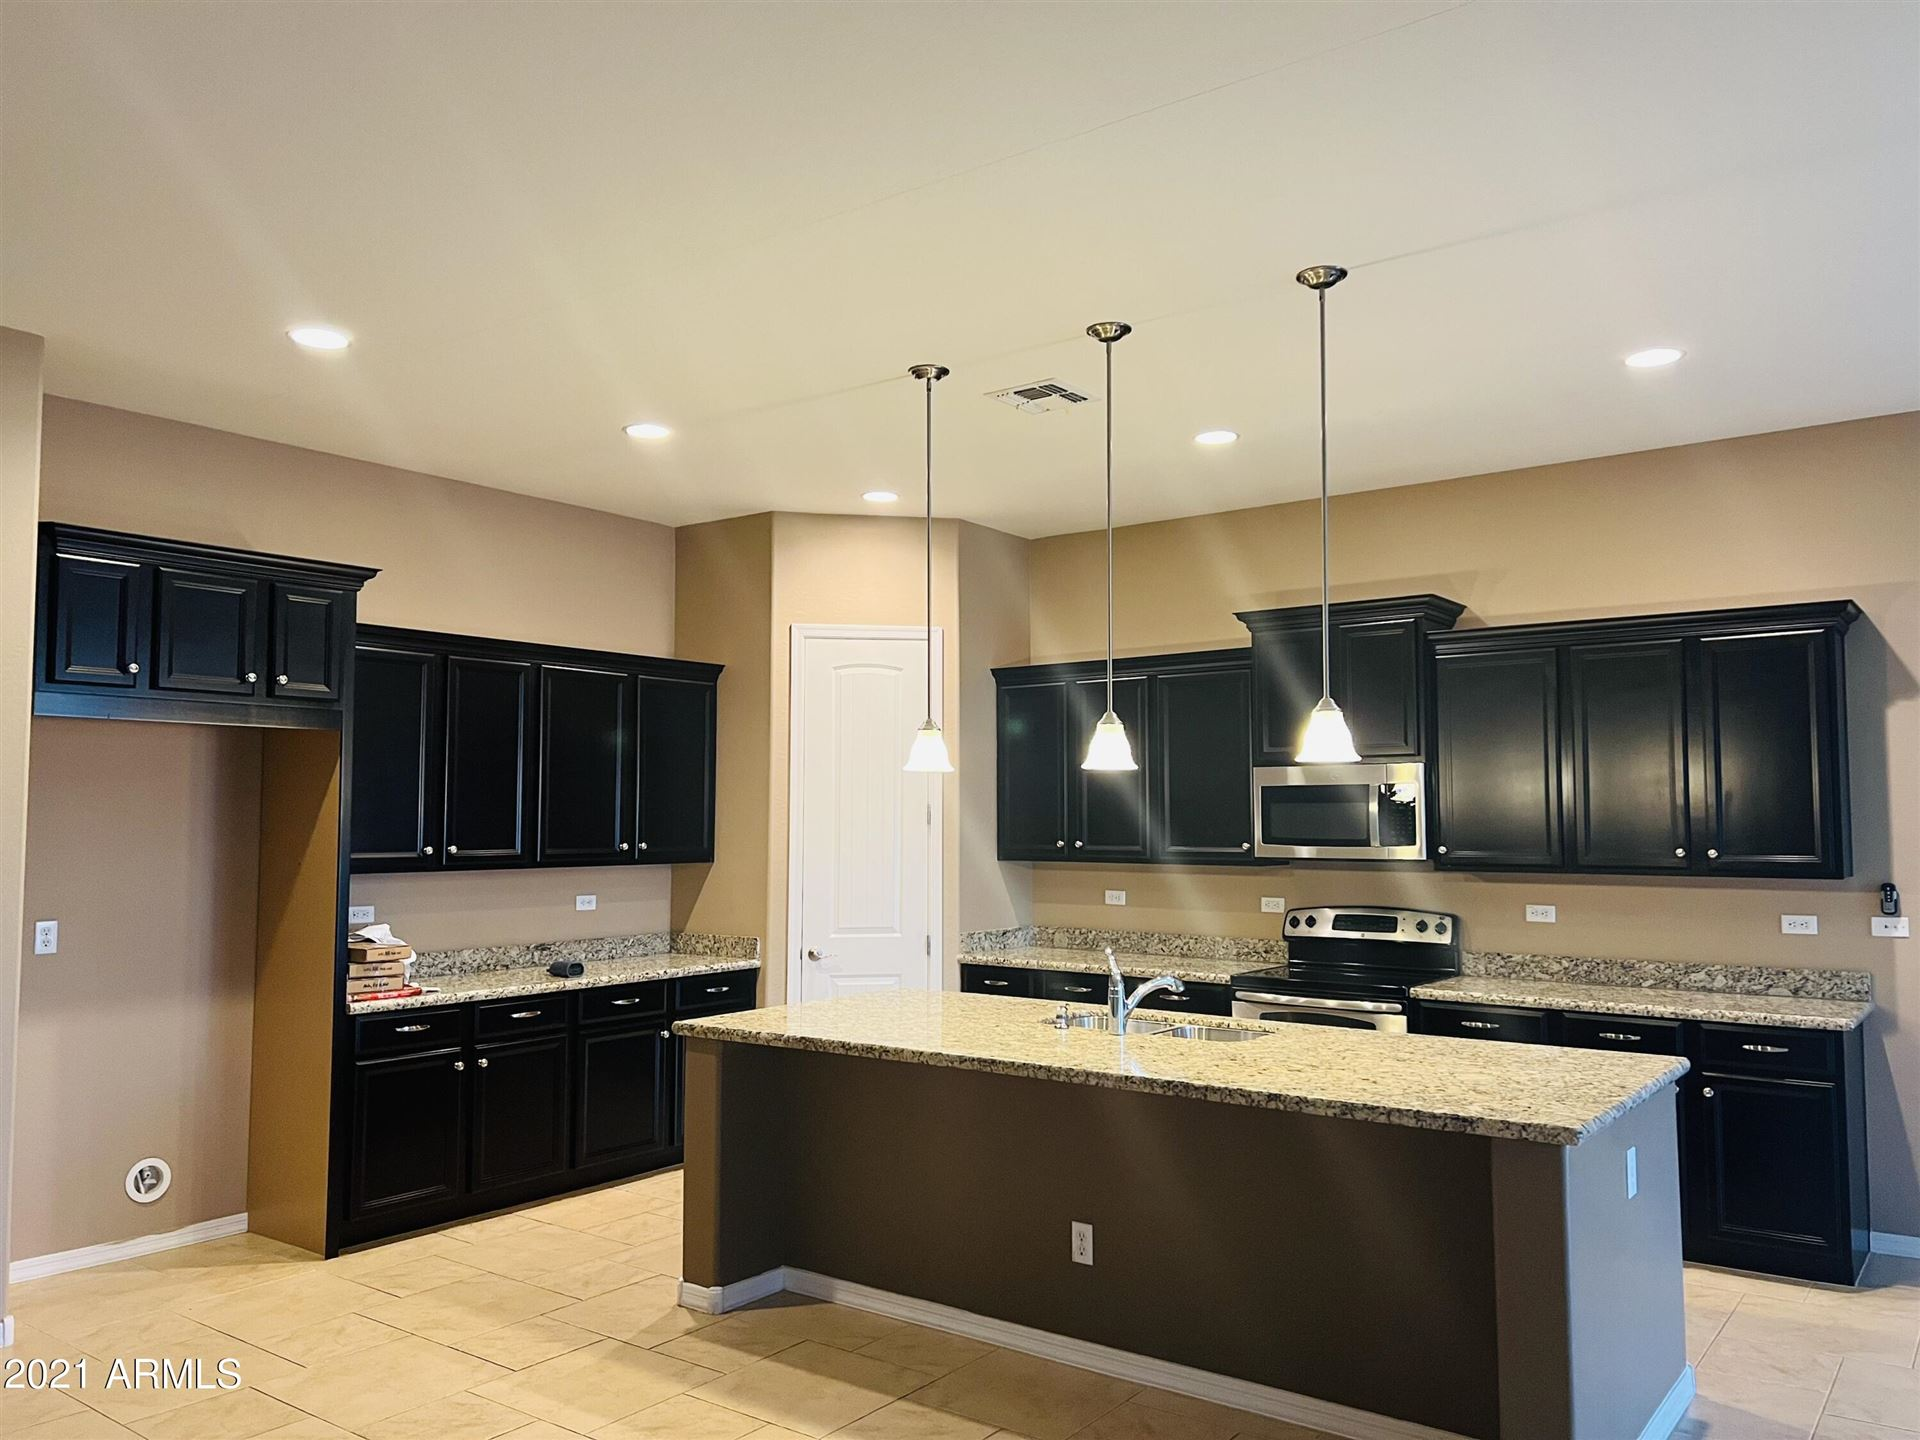 Photo of 20465 W HAMILTON Street, Buckeye, AZ 85396 (MLS # 6307571)